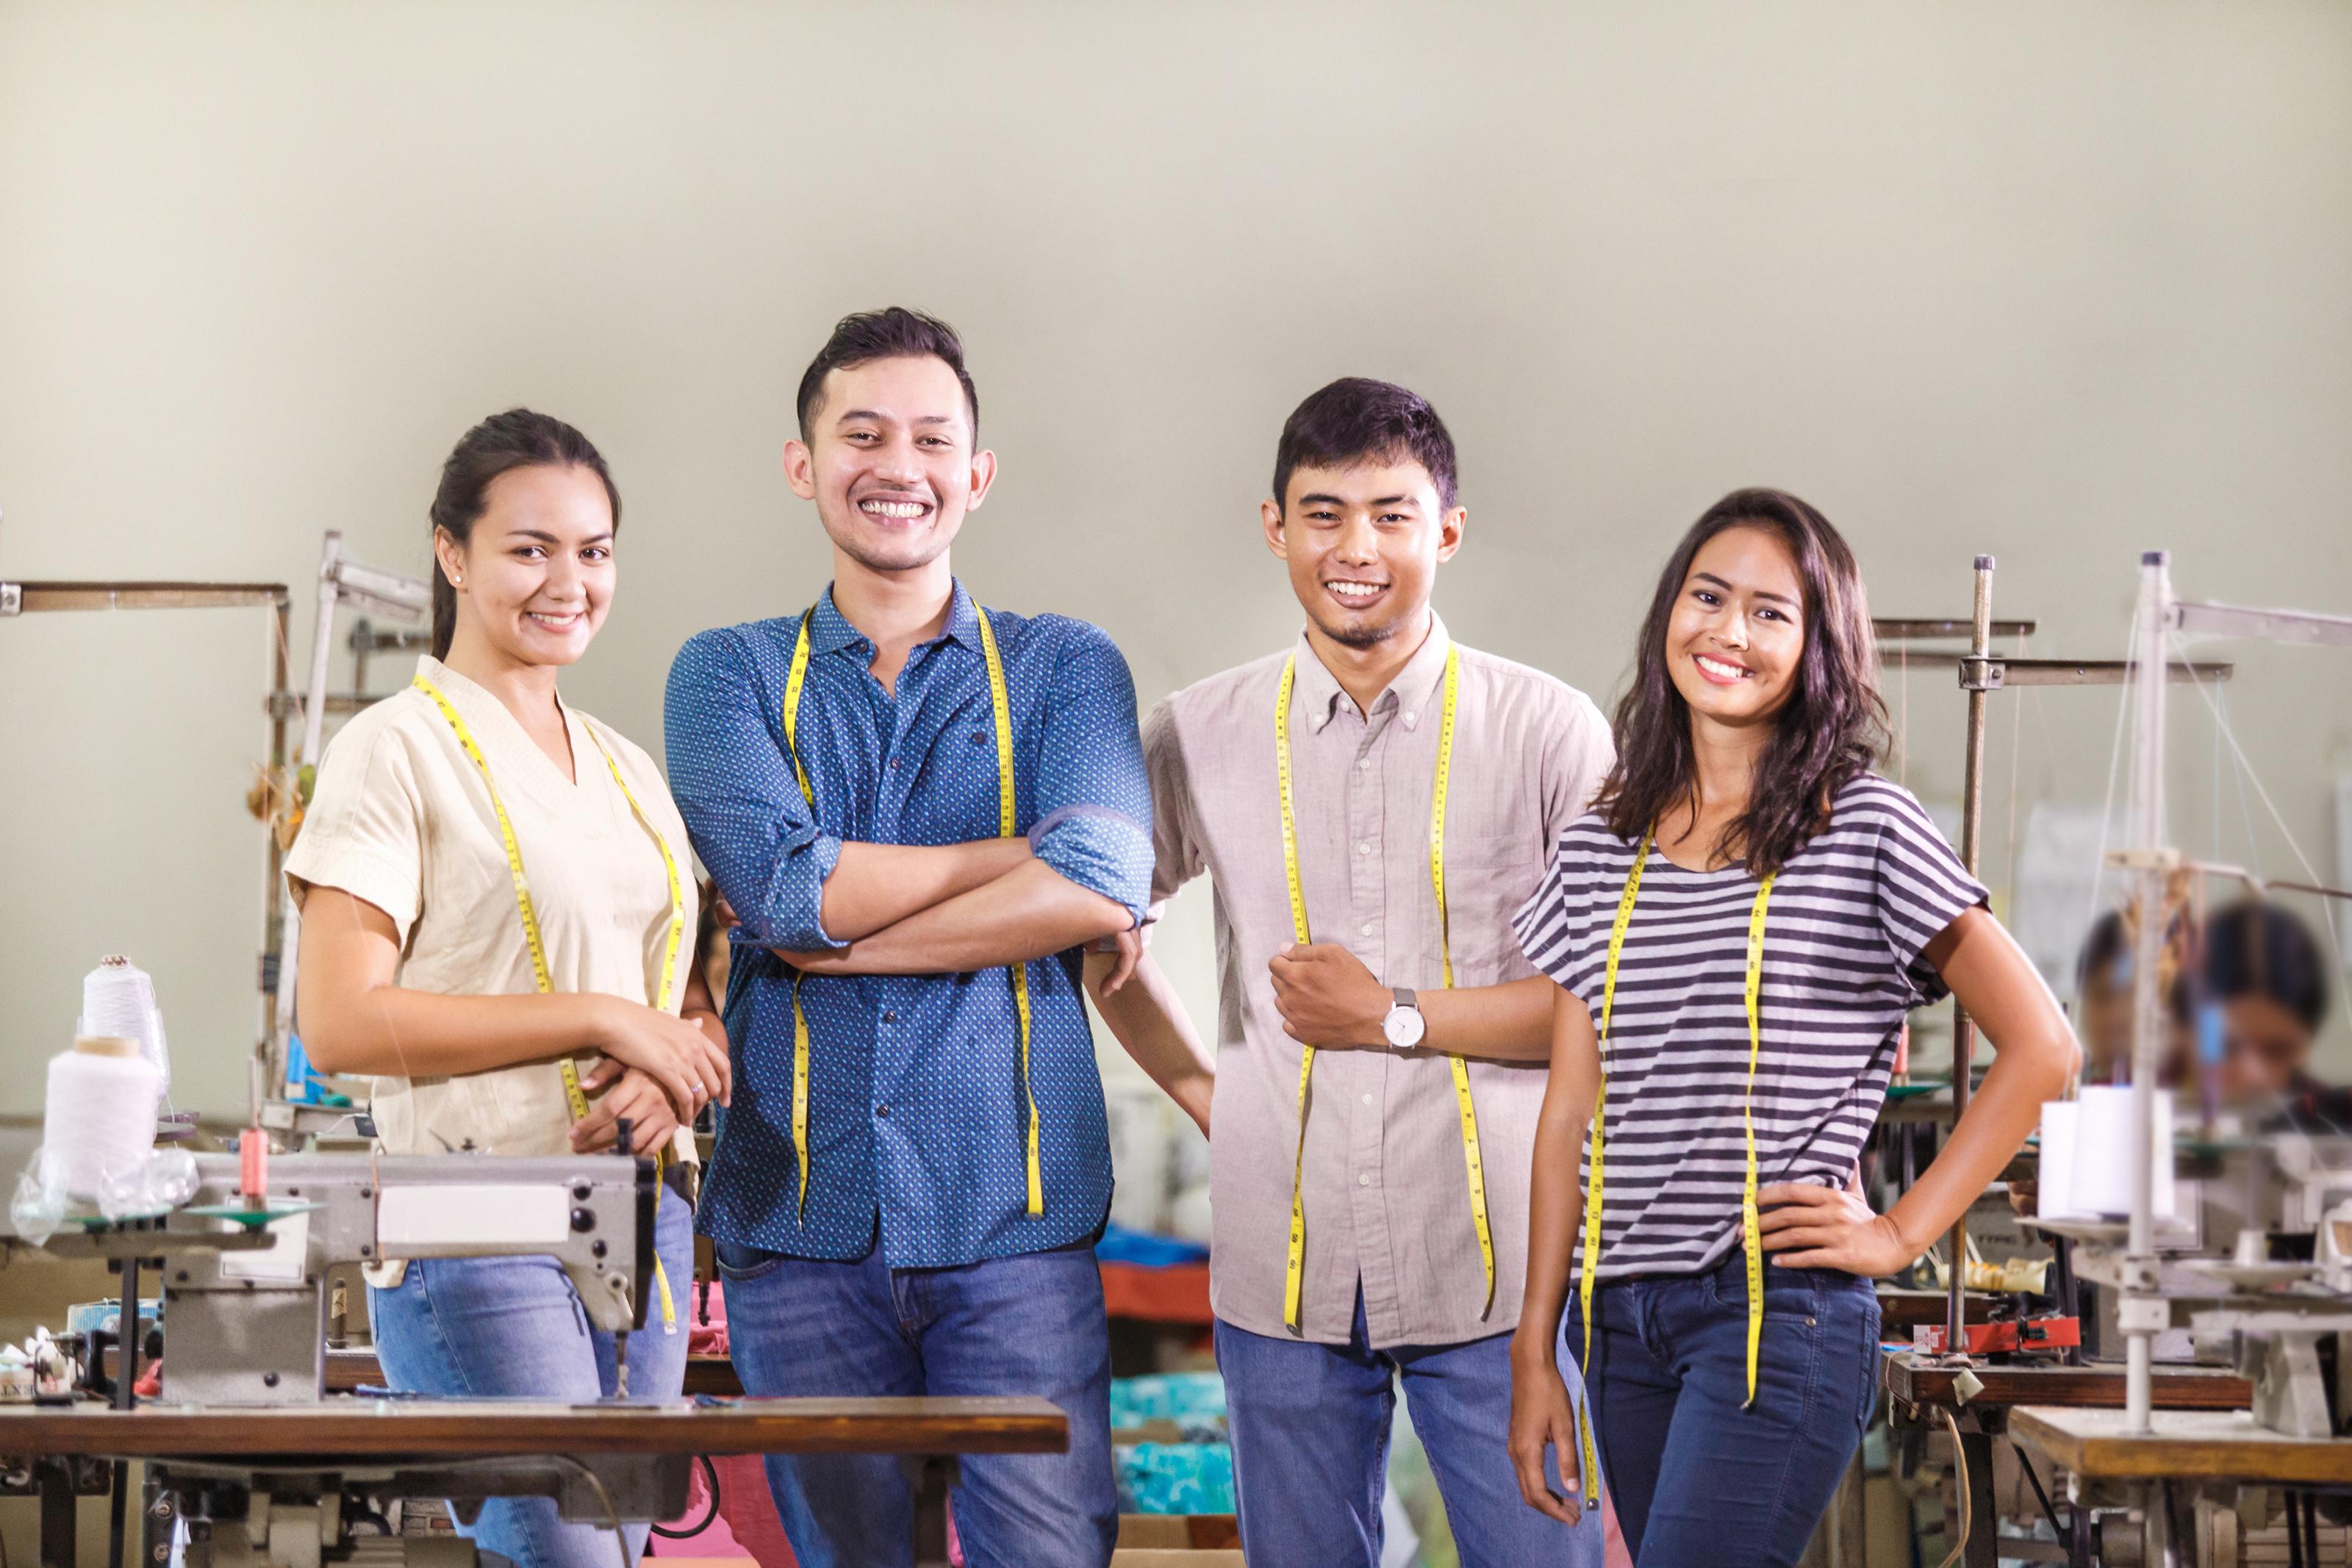 Primary Healhtcare ดูแลสุขภาวะแรงงาน thaihealth